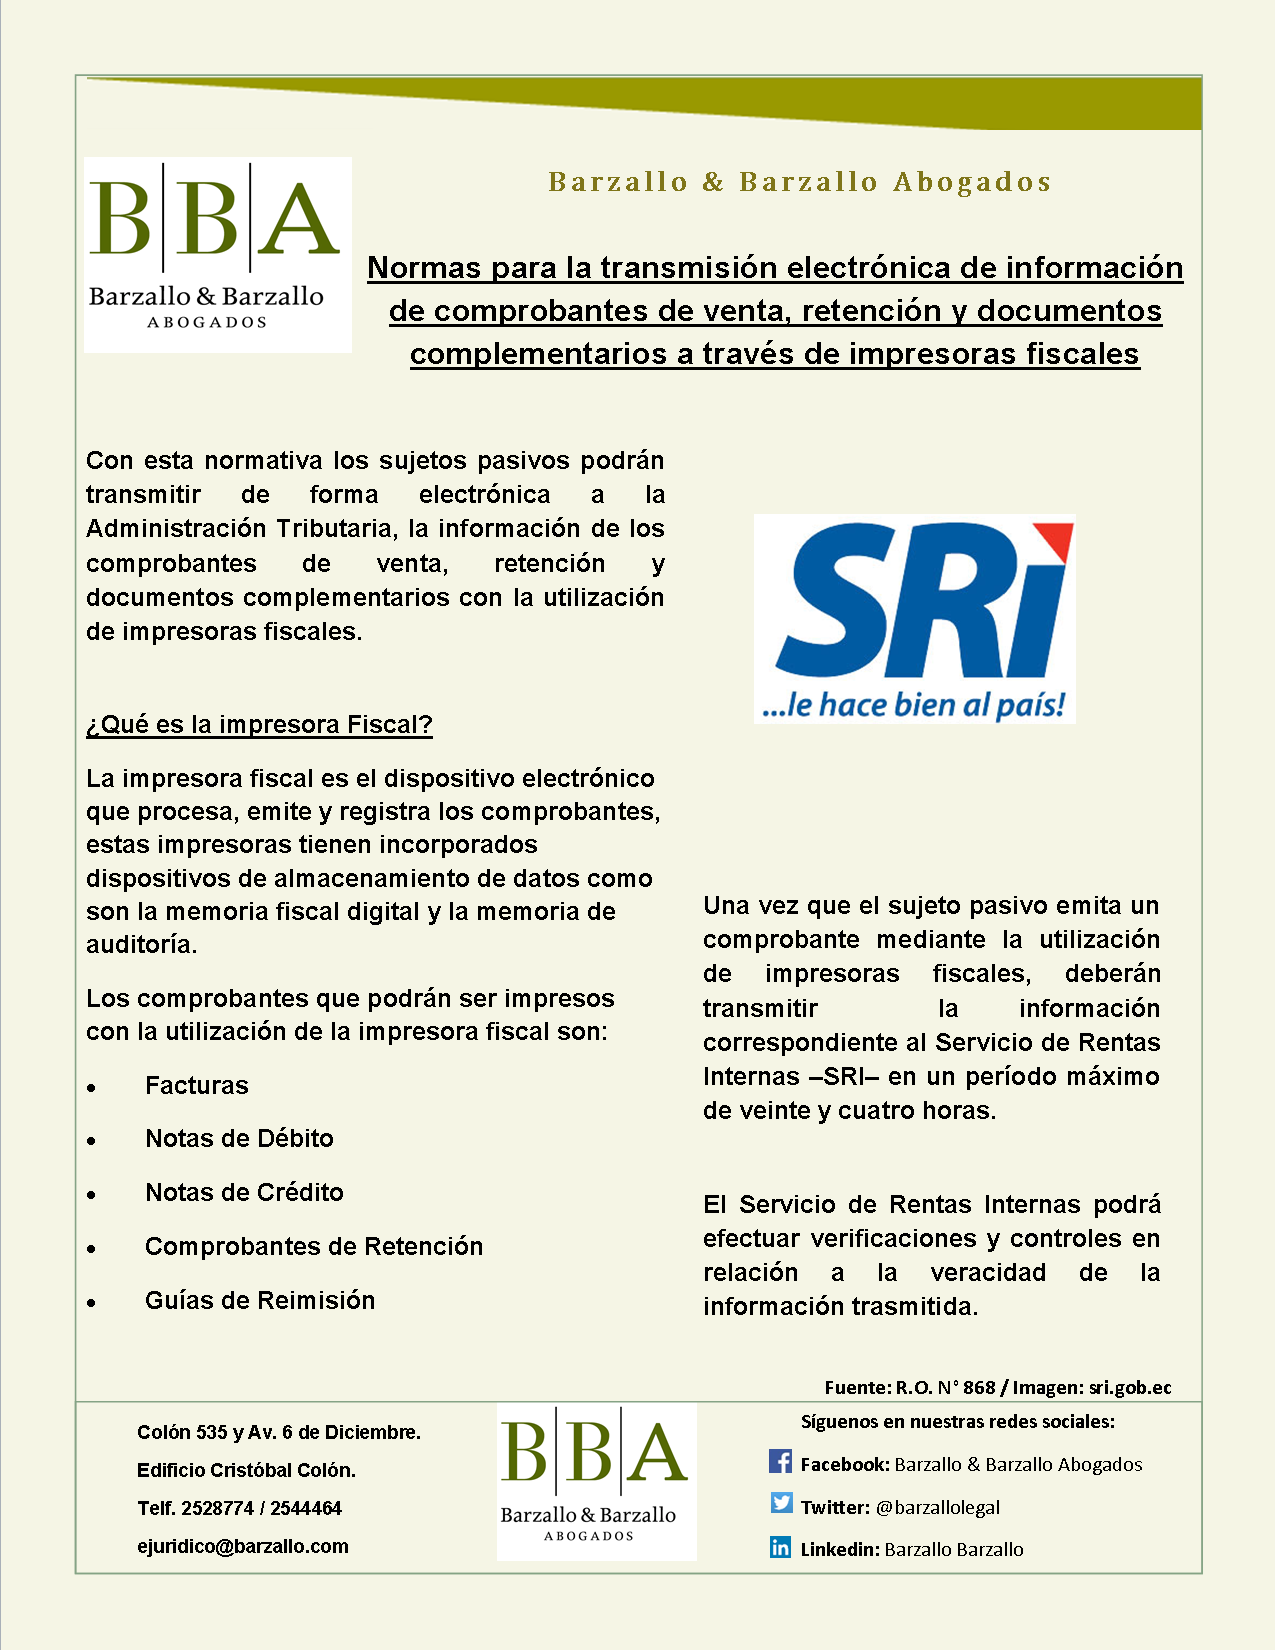 http://barzallo.com/noticias-2/sri-impresoras-fiscales-3/#main